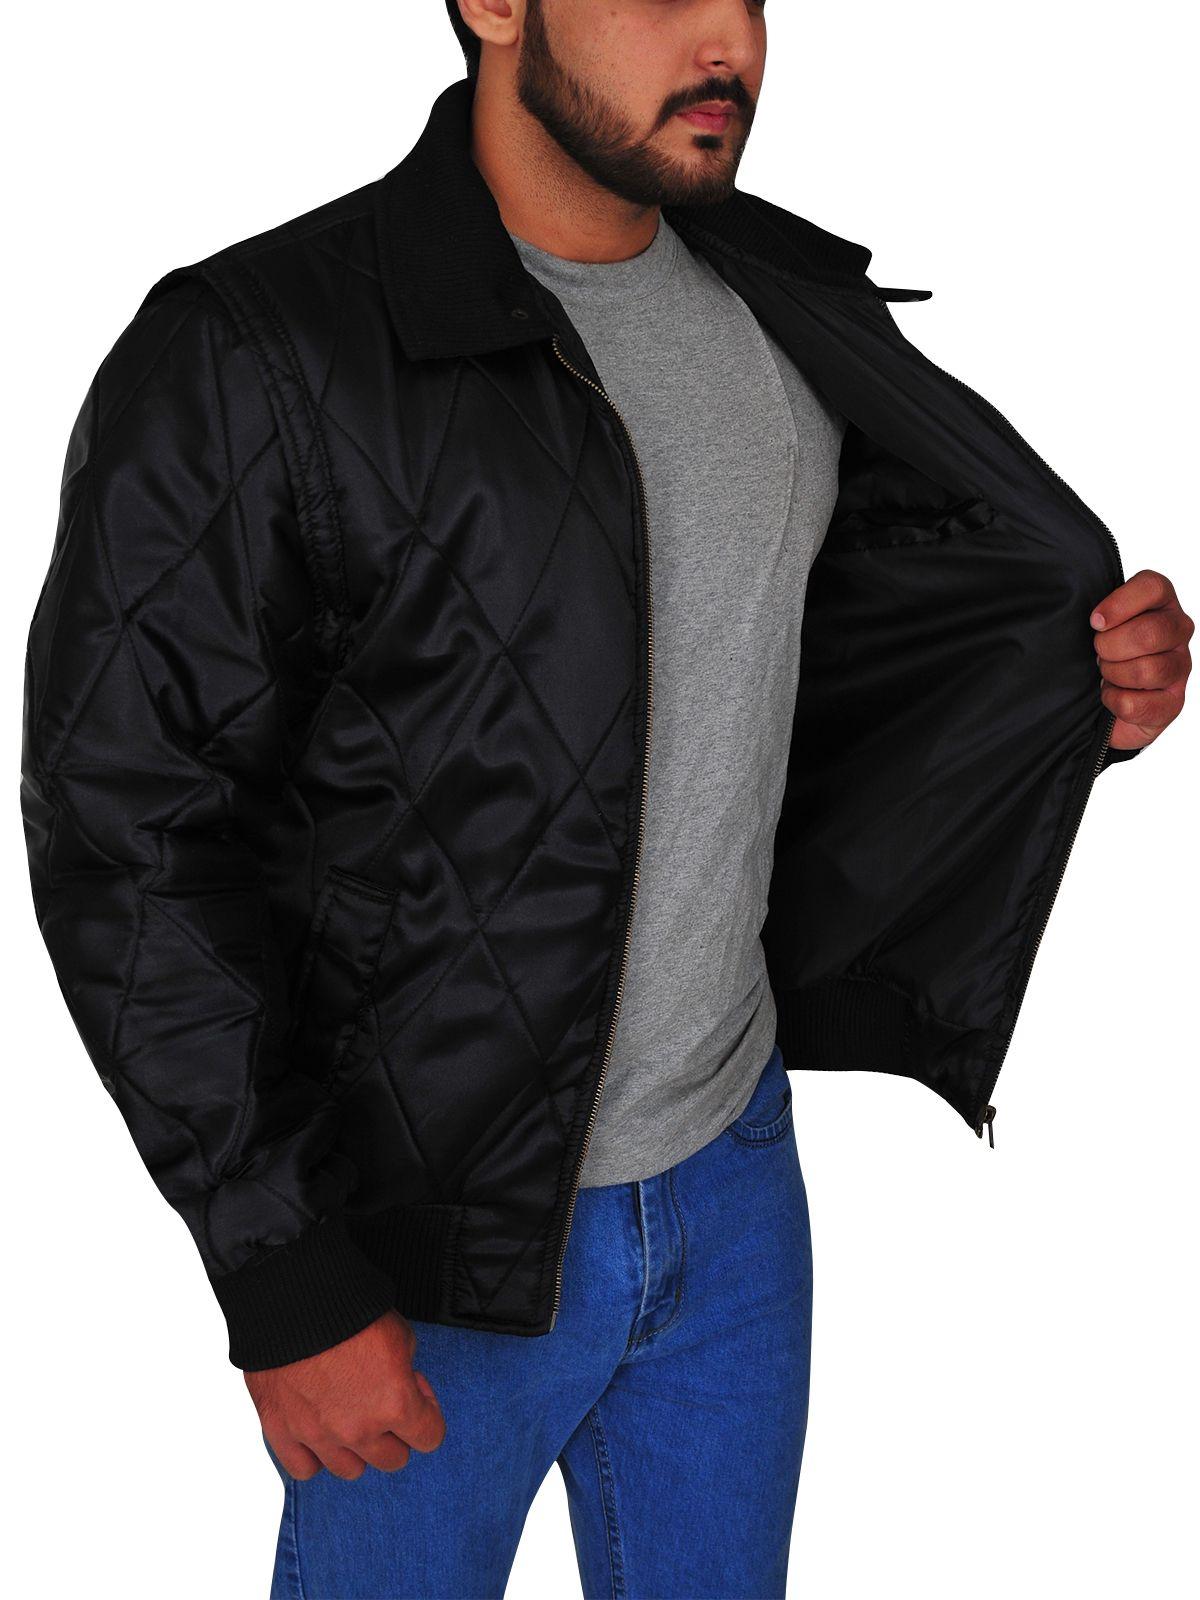 Ryan Gosling Scorpion Drive Logo Jacket Top Celebs Jackets Jacket Tops Jackets Shirt Style [ 1600 x 1200 Pixel ]